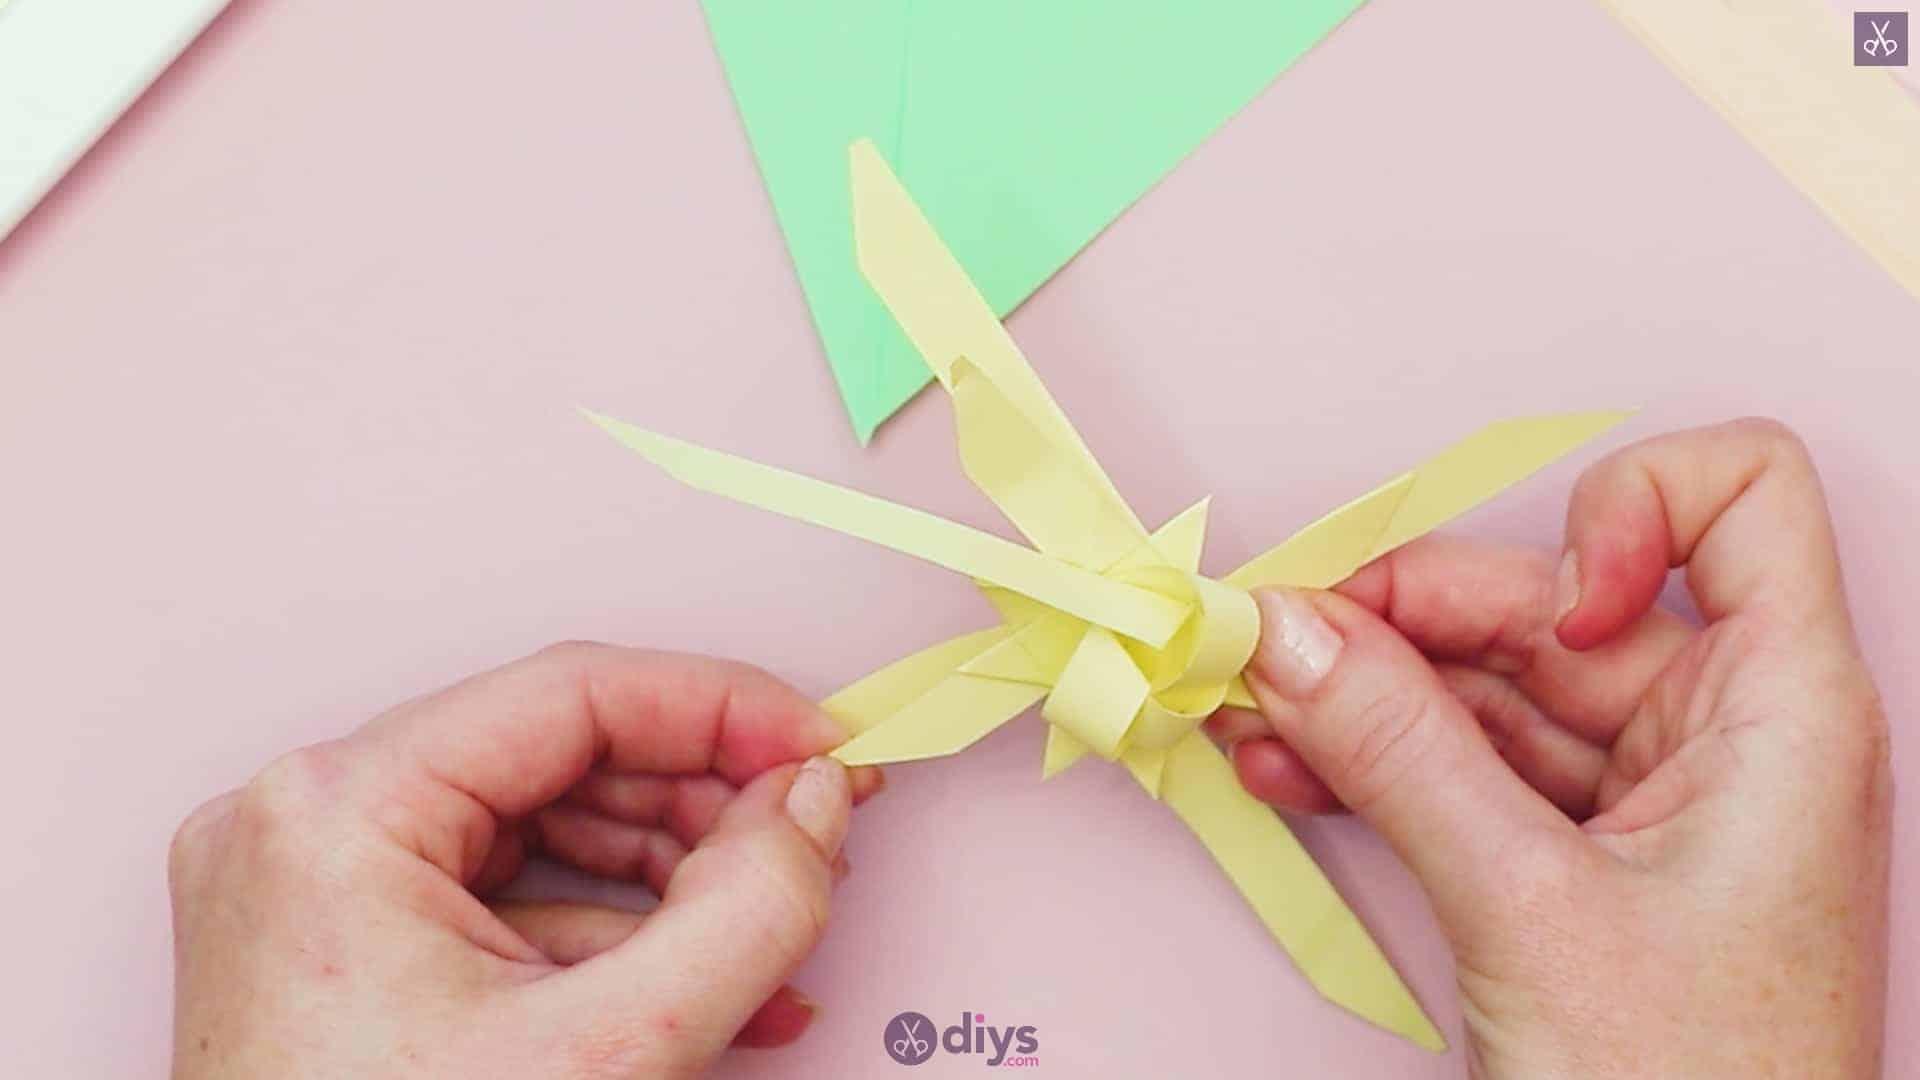 Diy origami flower art step 7c